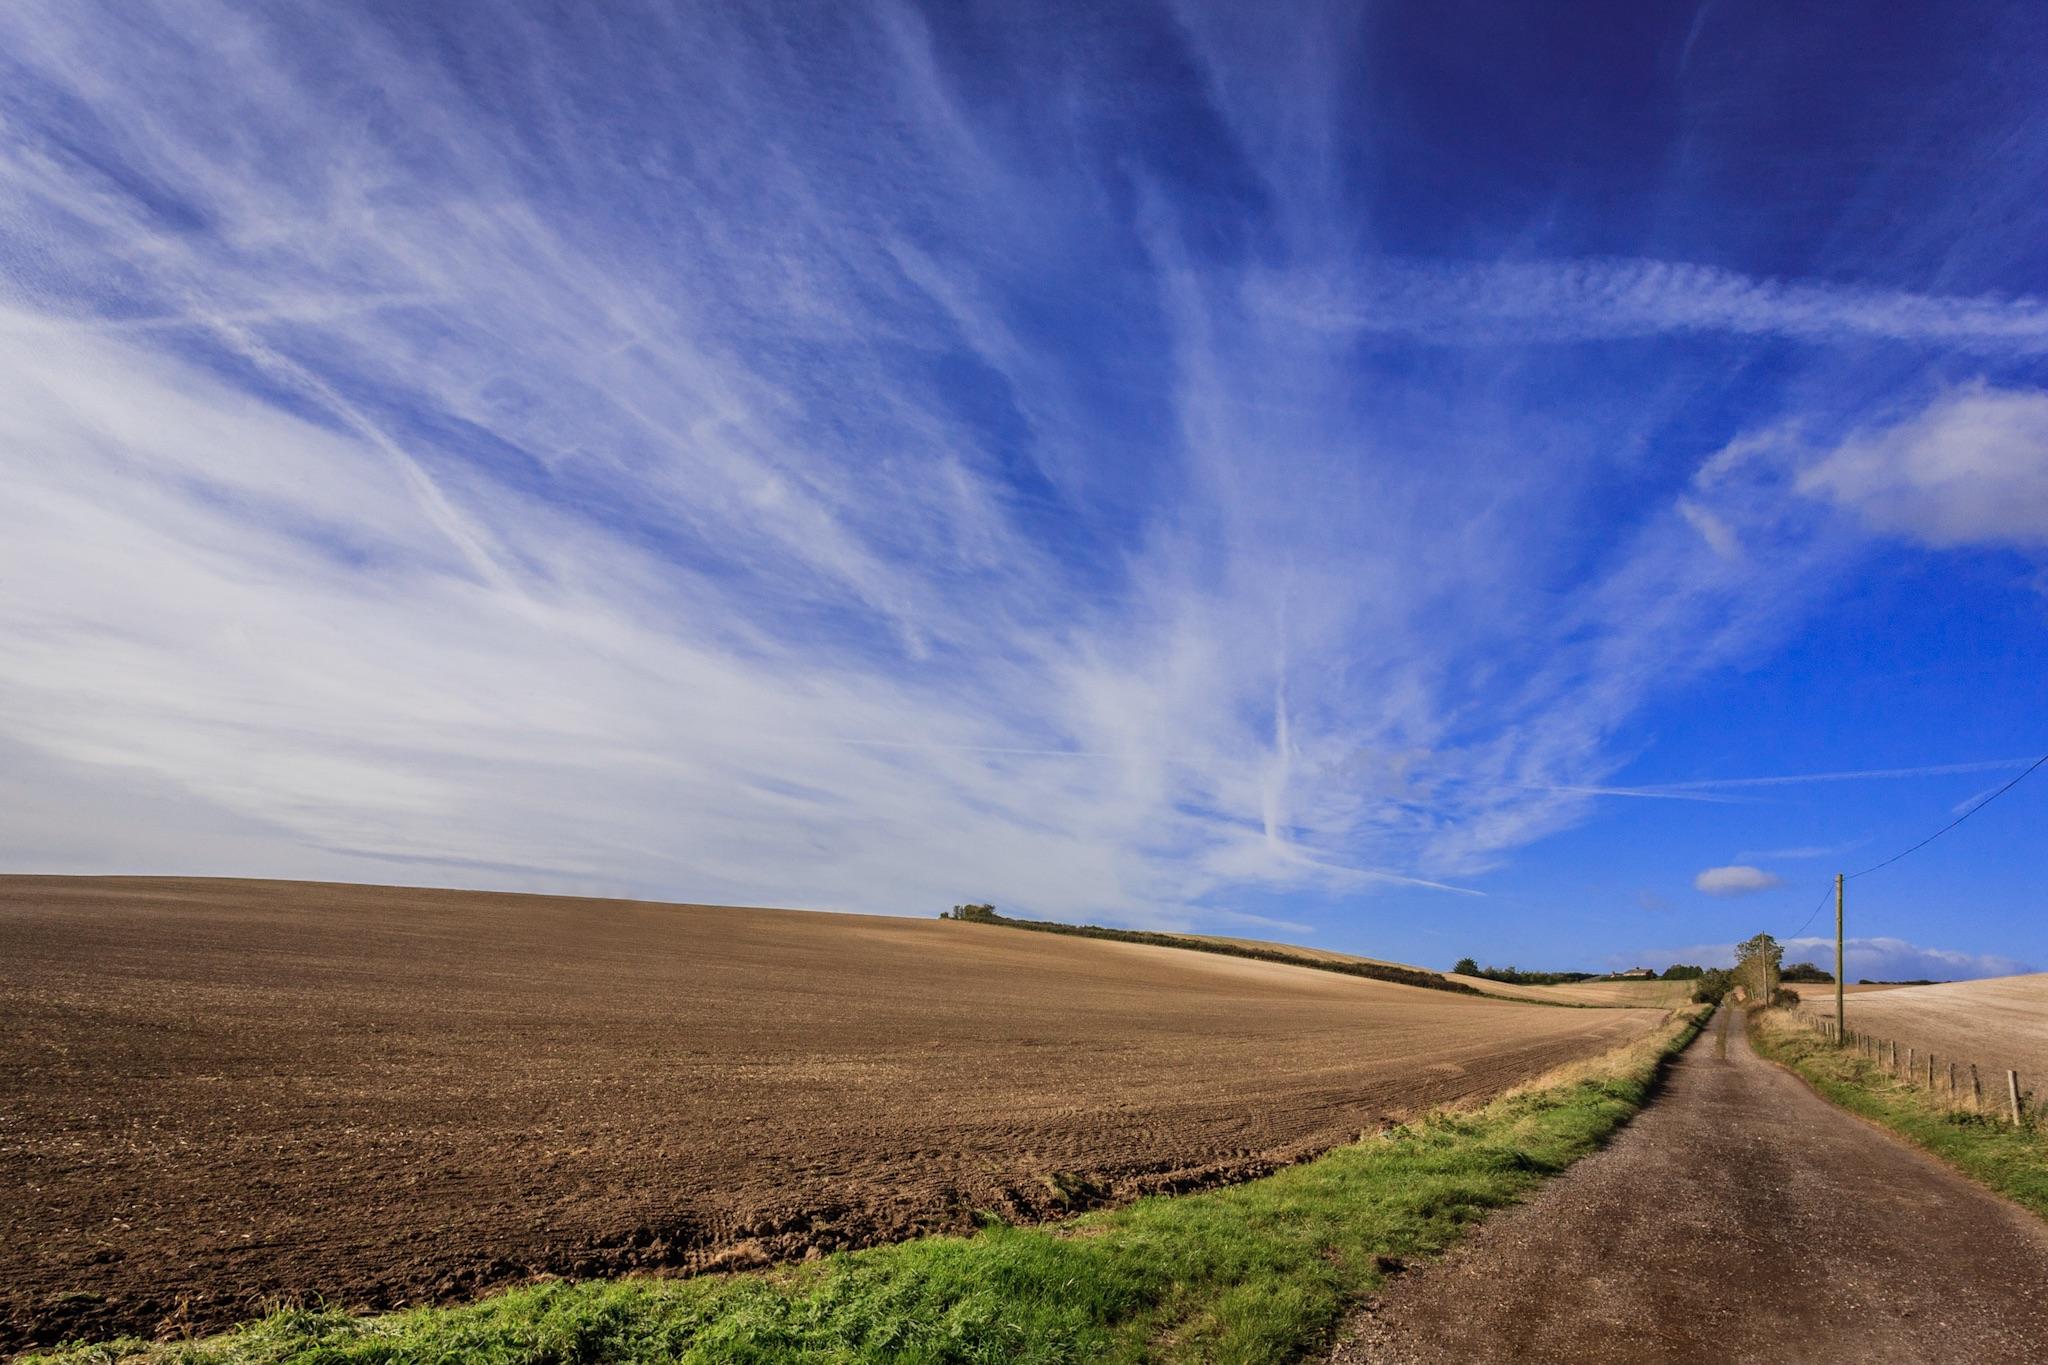 Field, Bere Regis